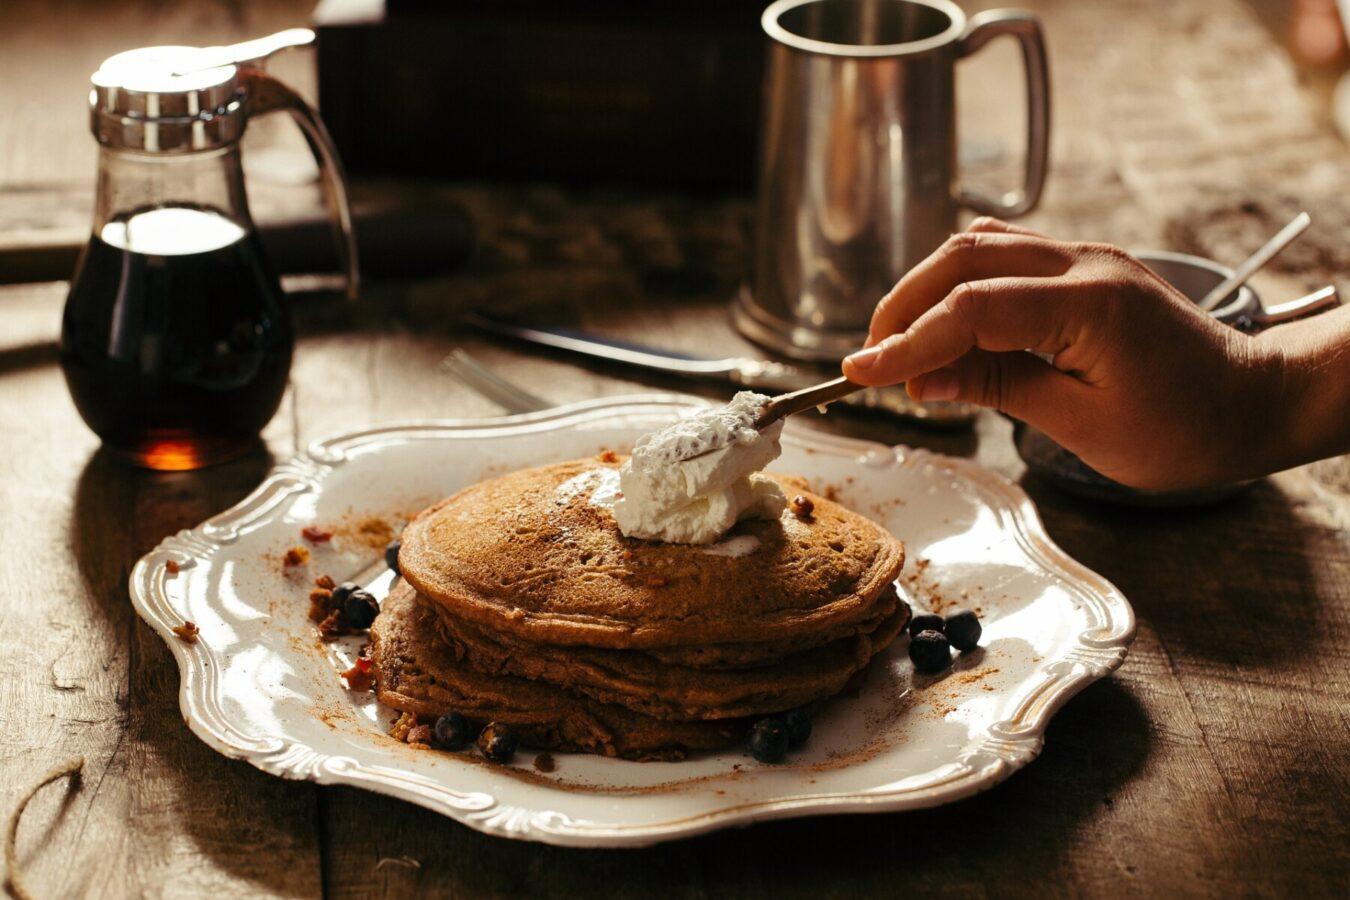 Classic Breakfast plate in Killington Vermont